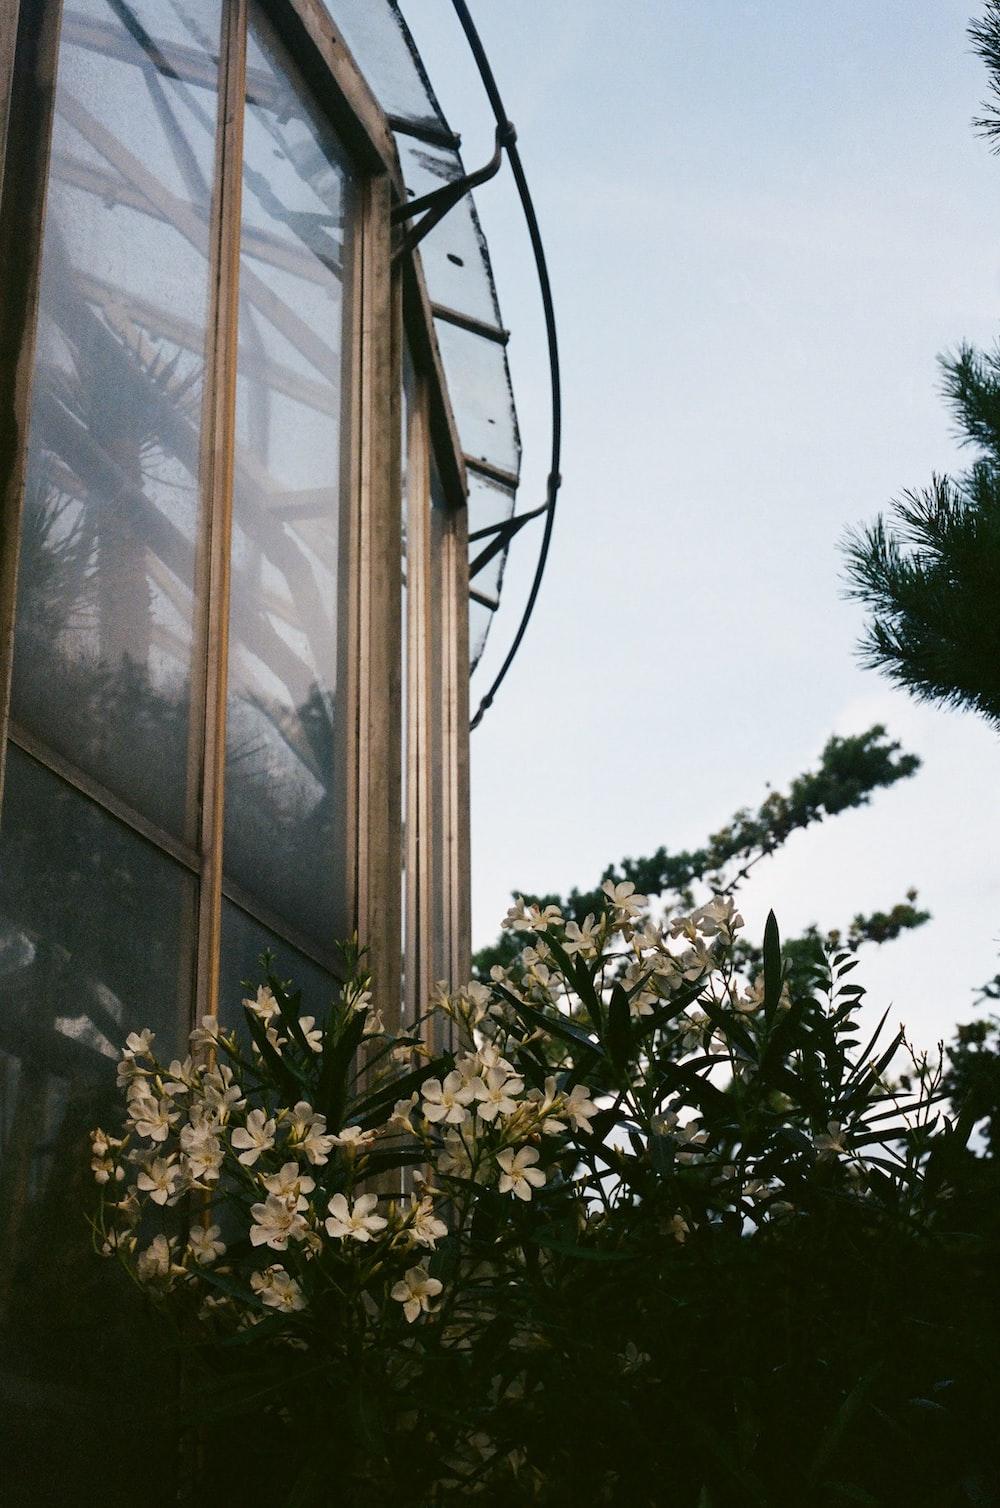 green tree near glass window